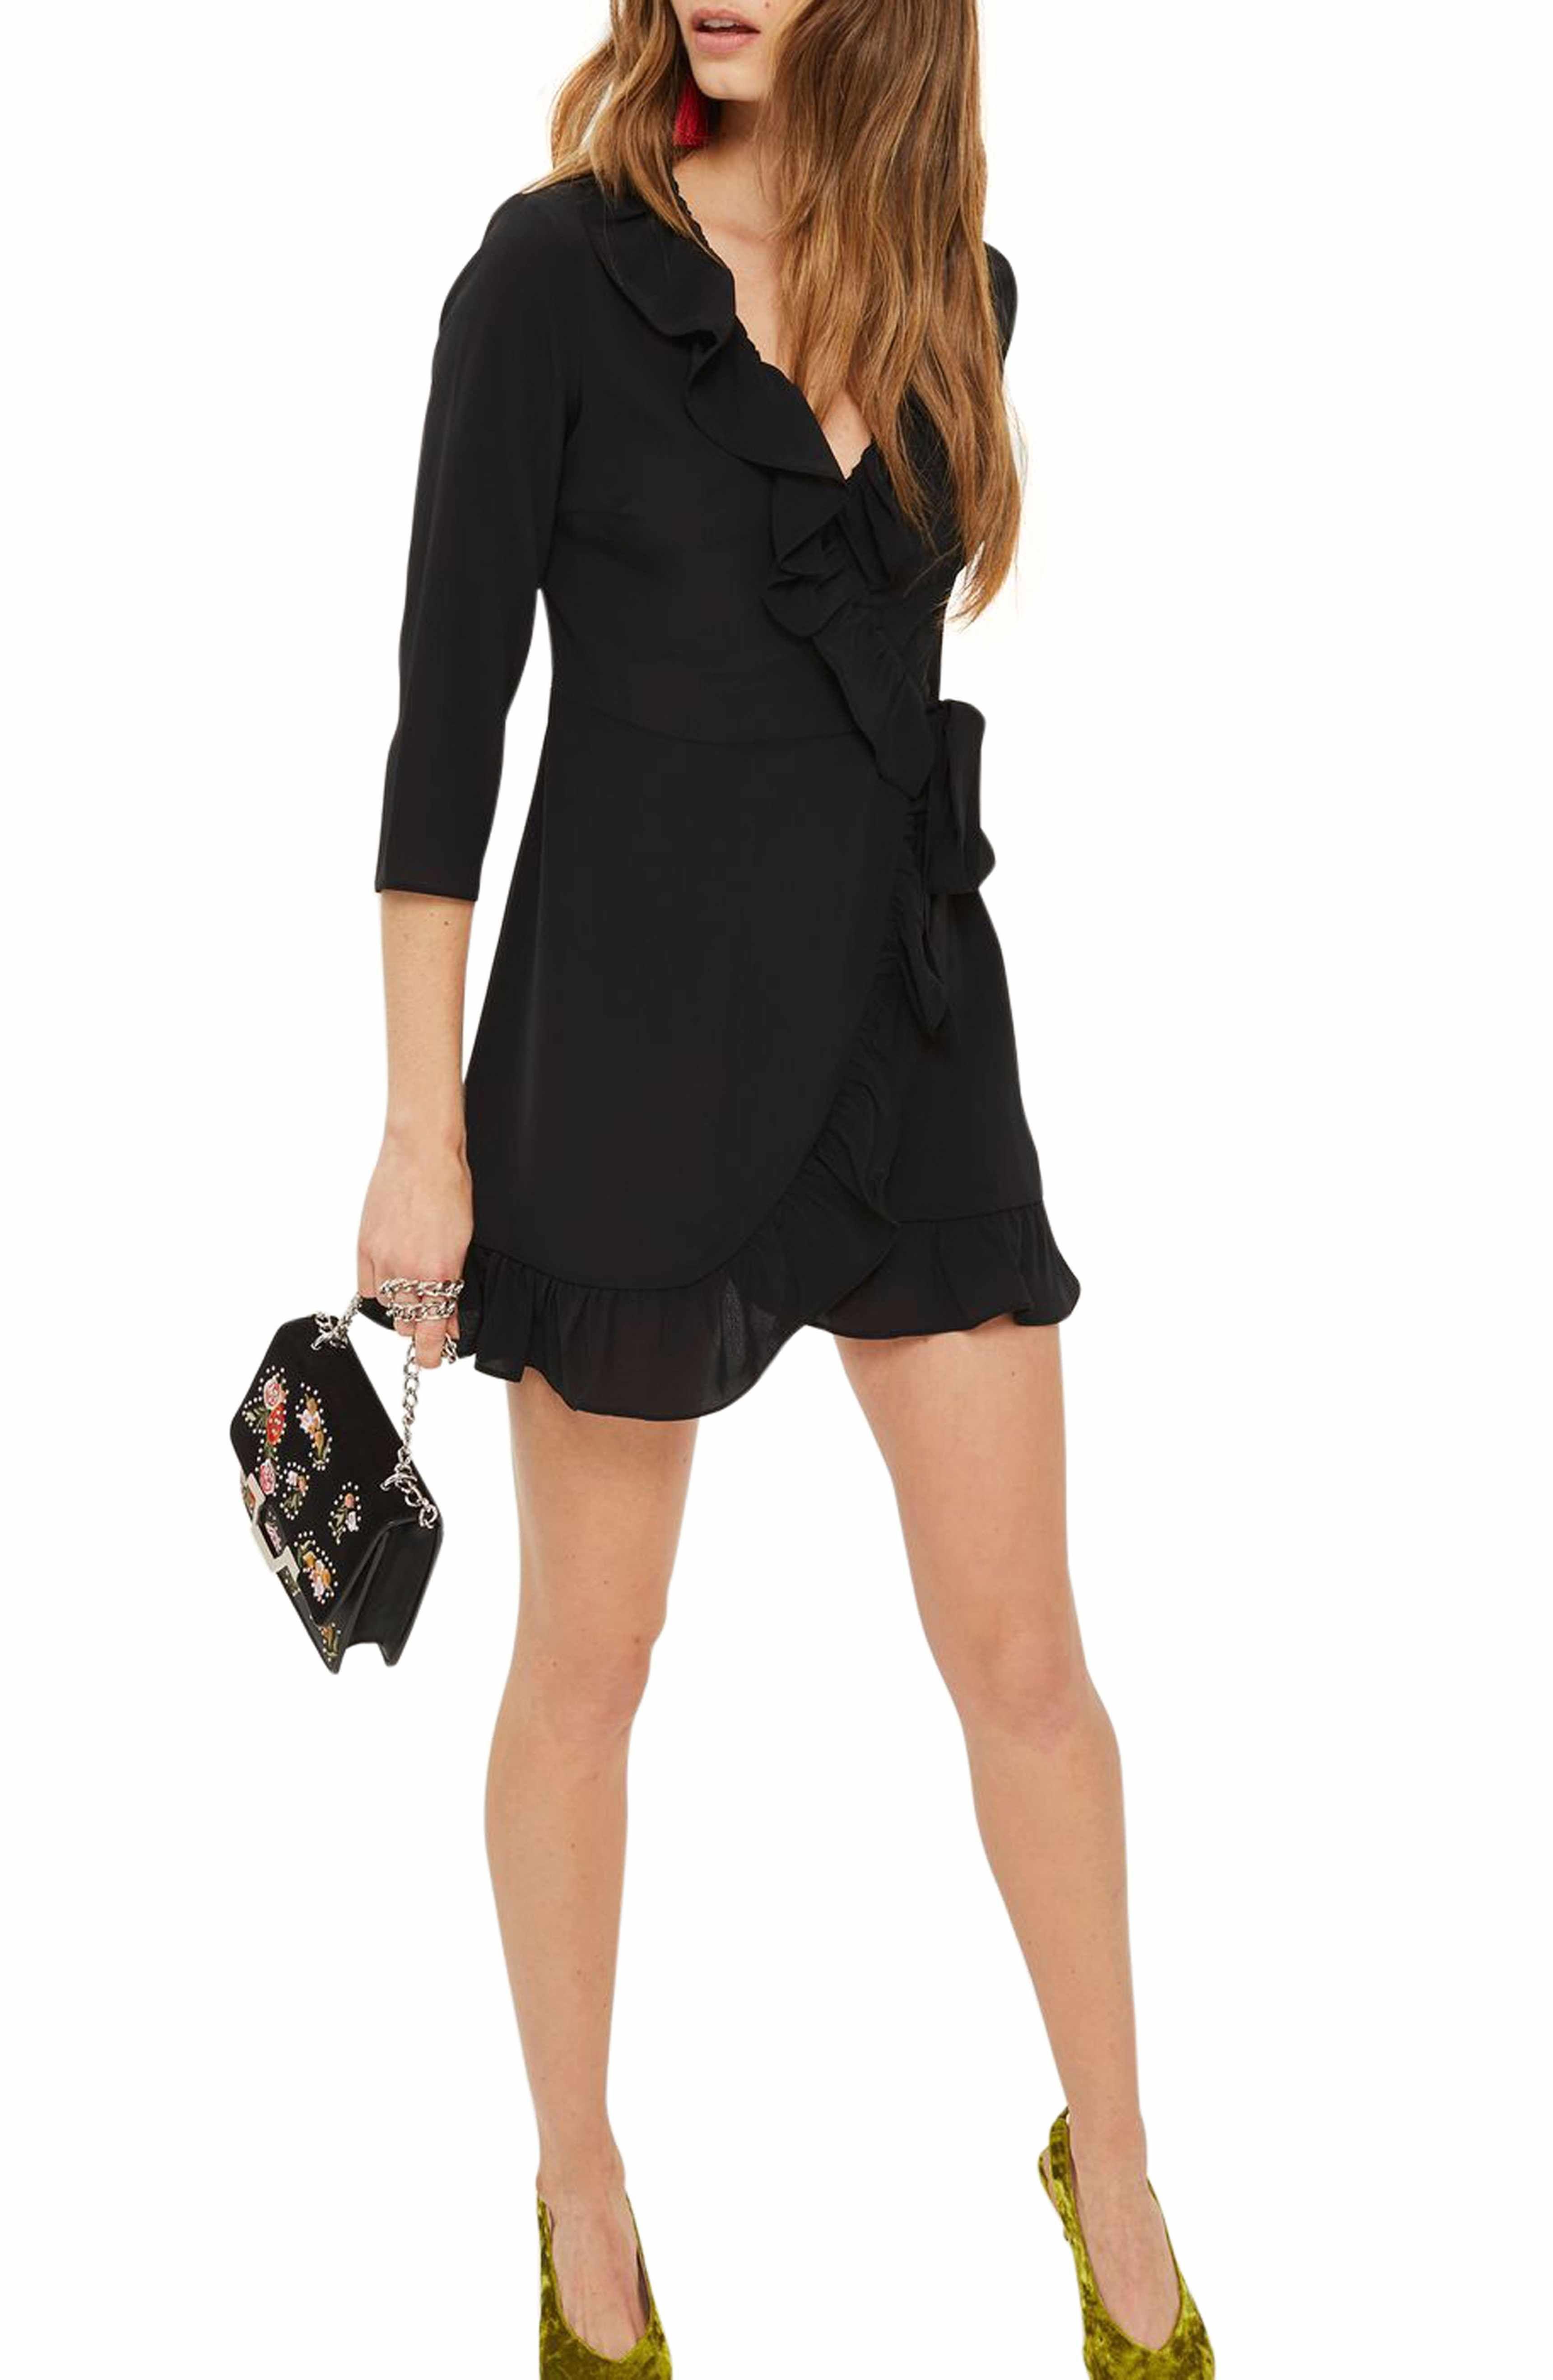 30e650e68c1e Main Image - Topshop Ruffle Wrap Dress | Fashion & Style after 50 ...